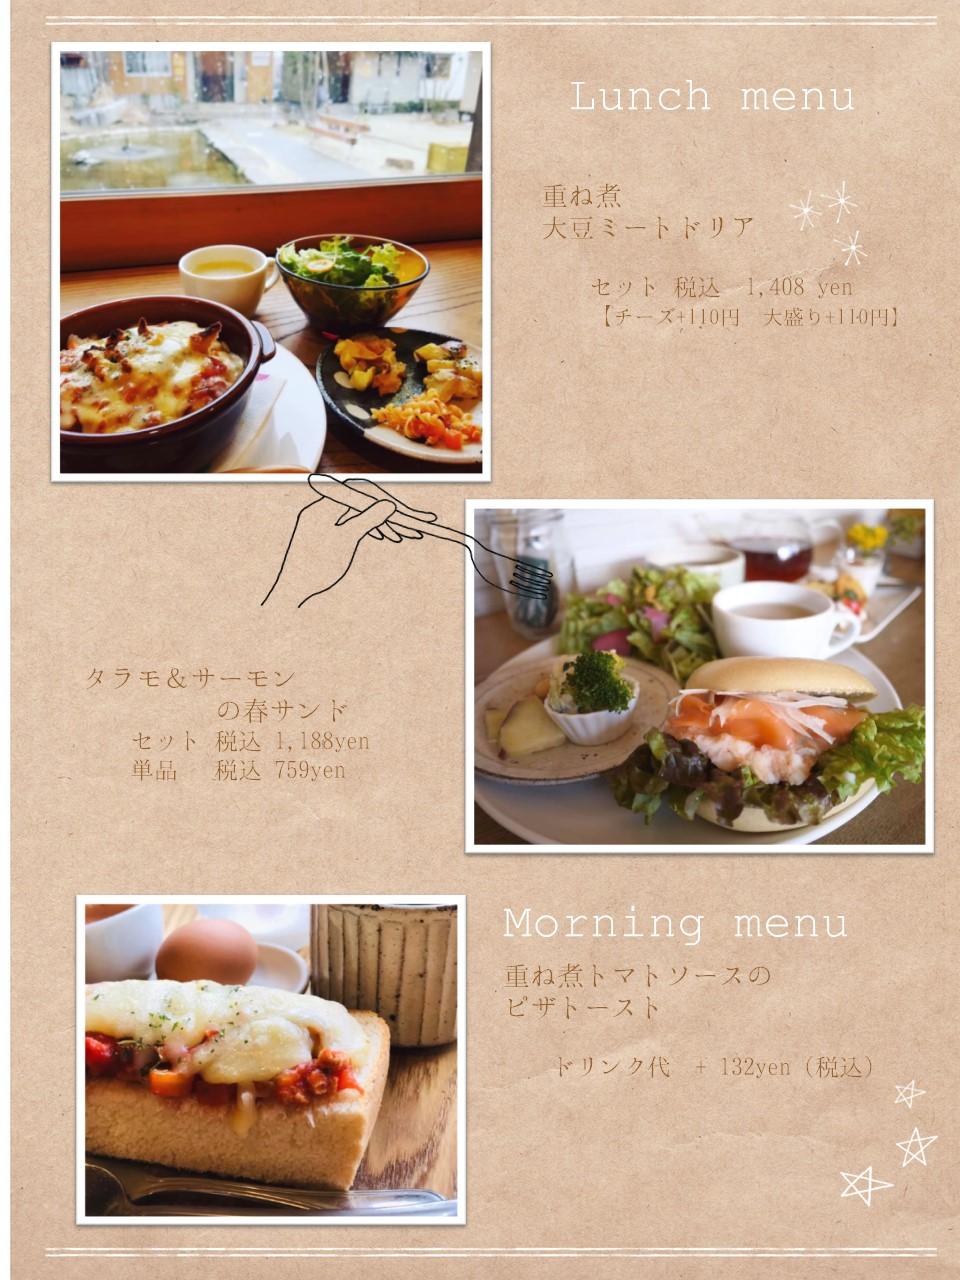 Hidamari cafe季節メニュー2